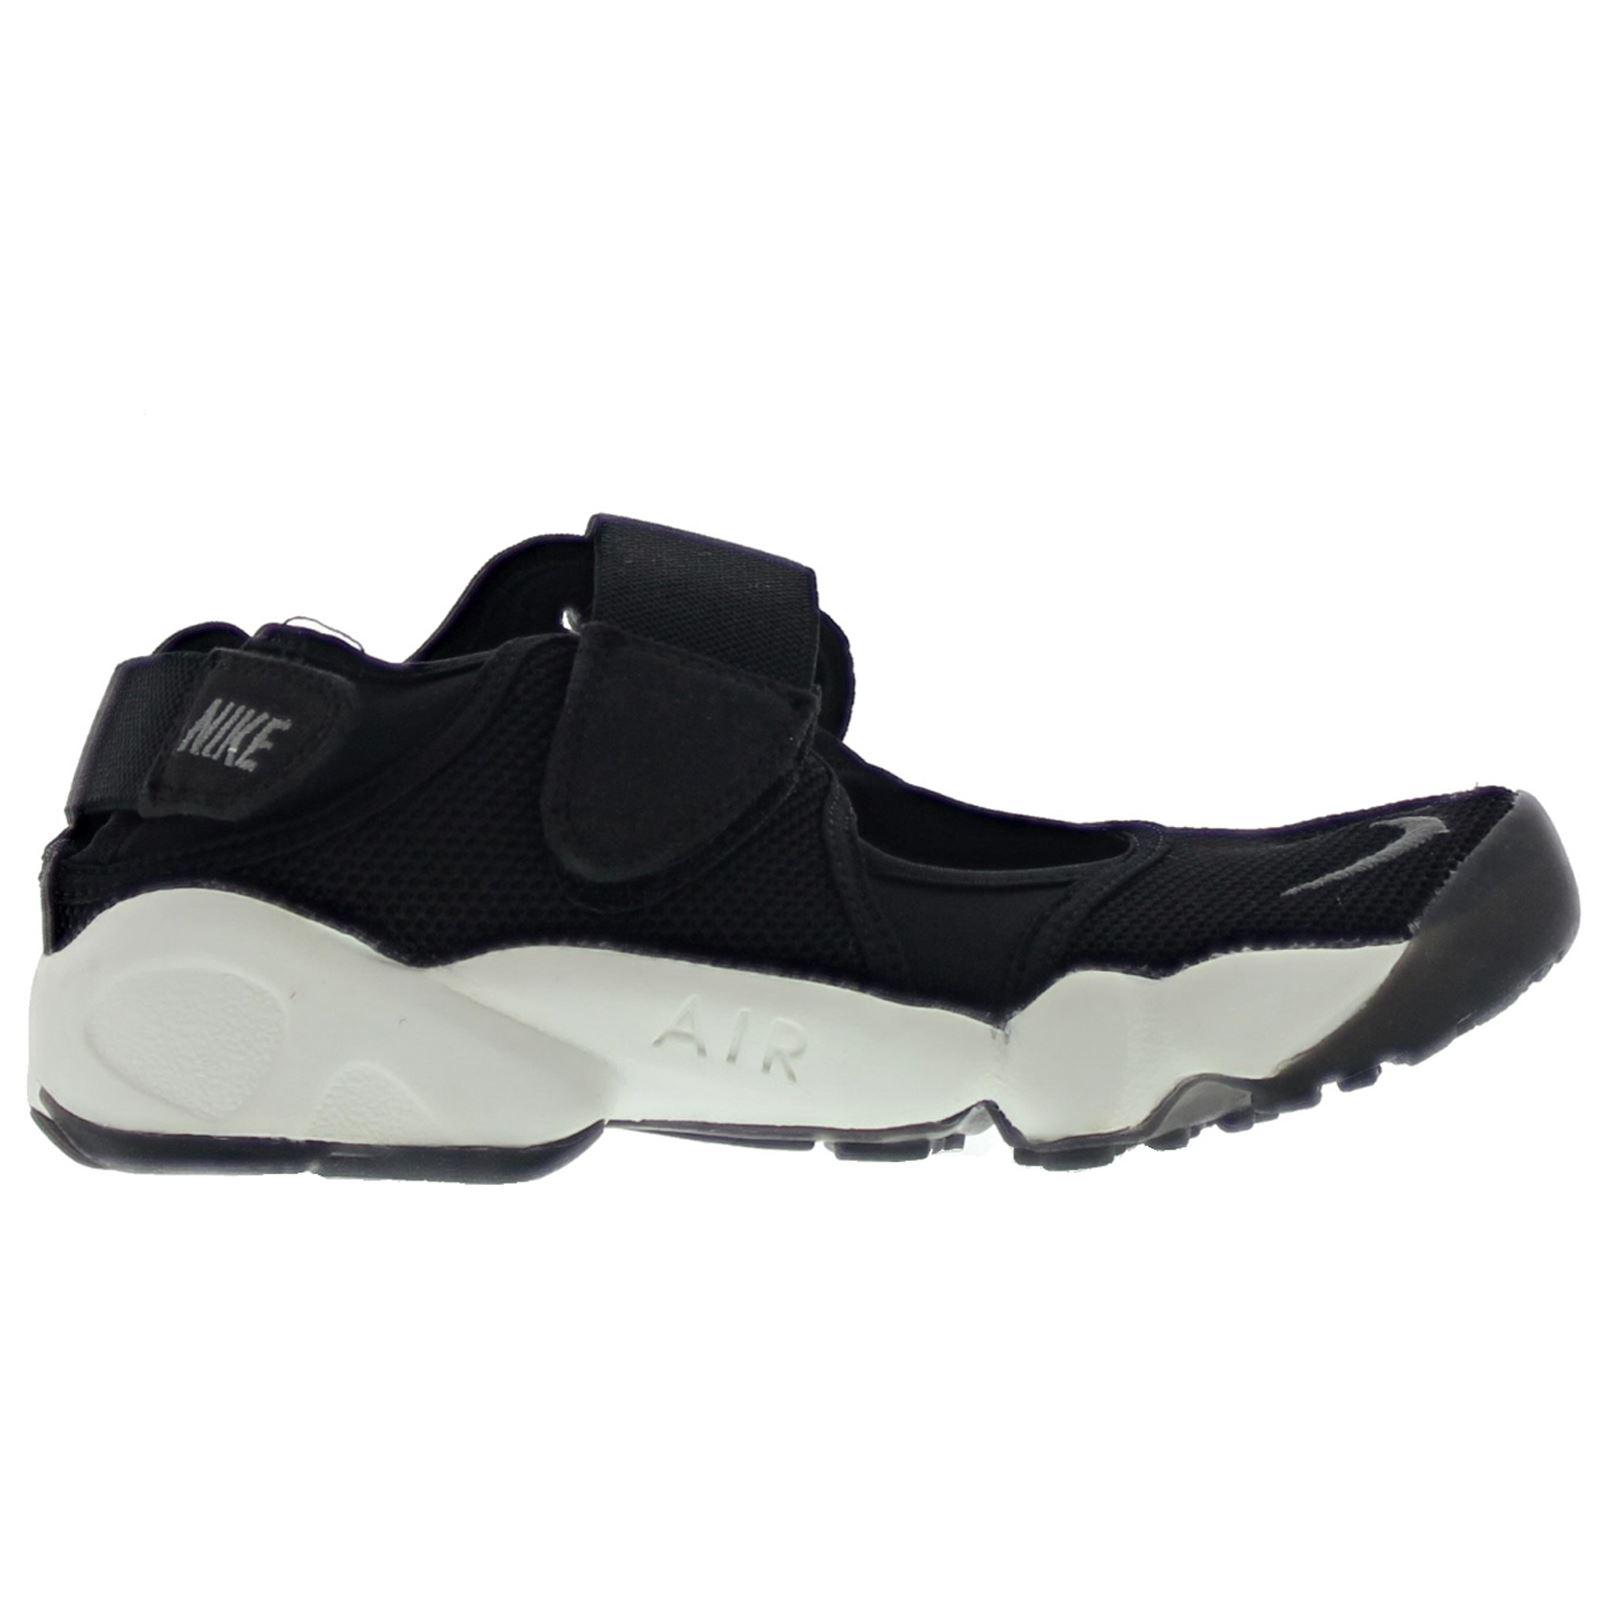 cf4dceae4d1422 Womens Nike Rift Size 9